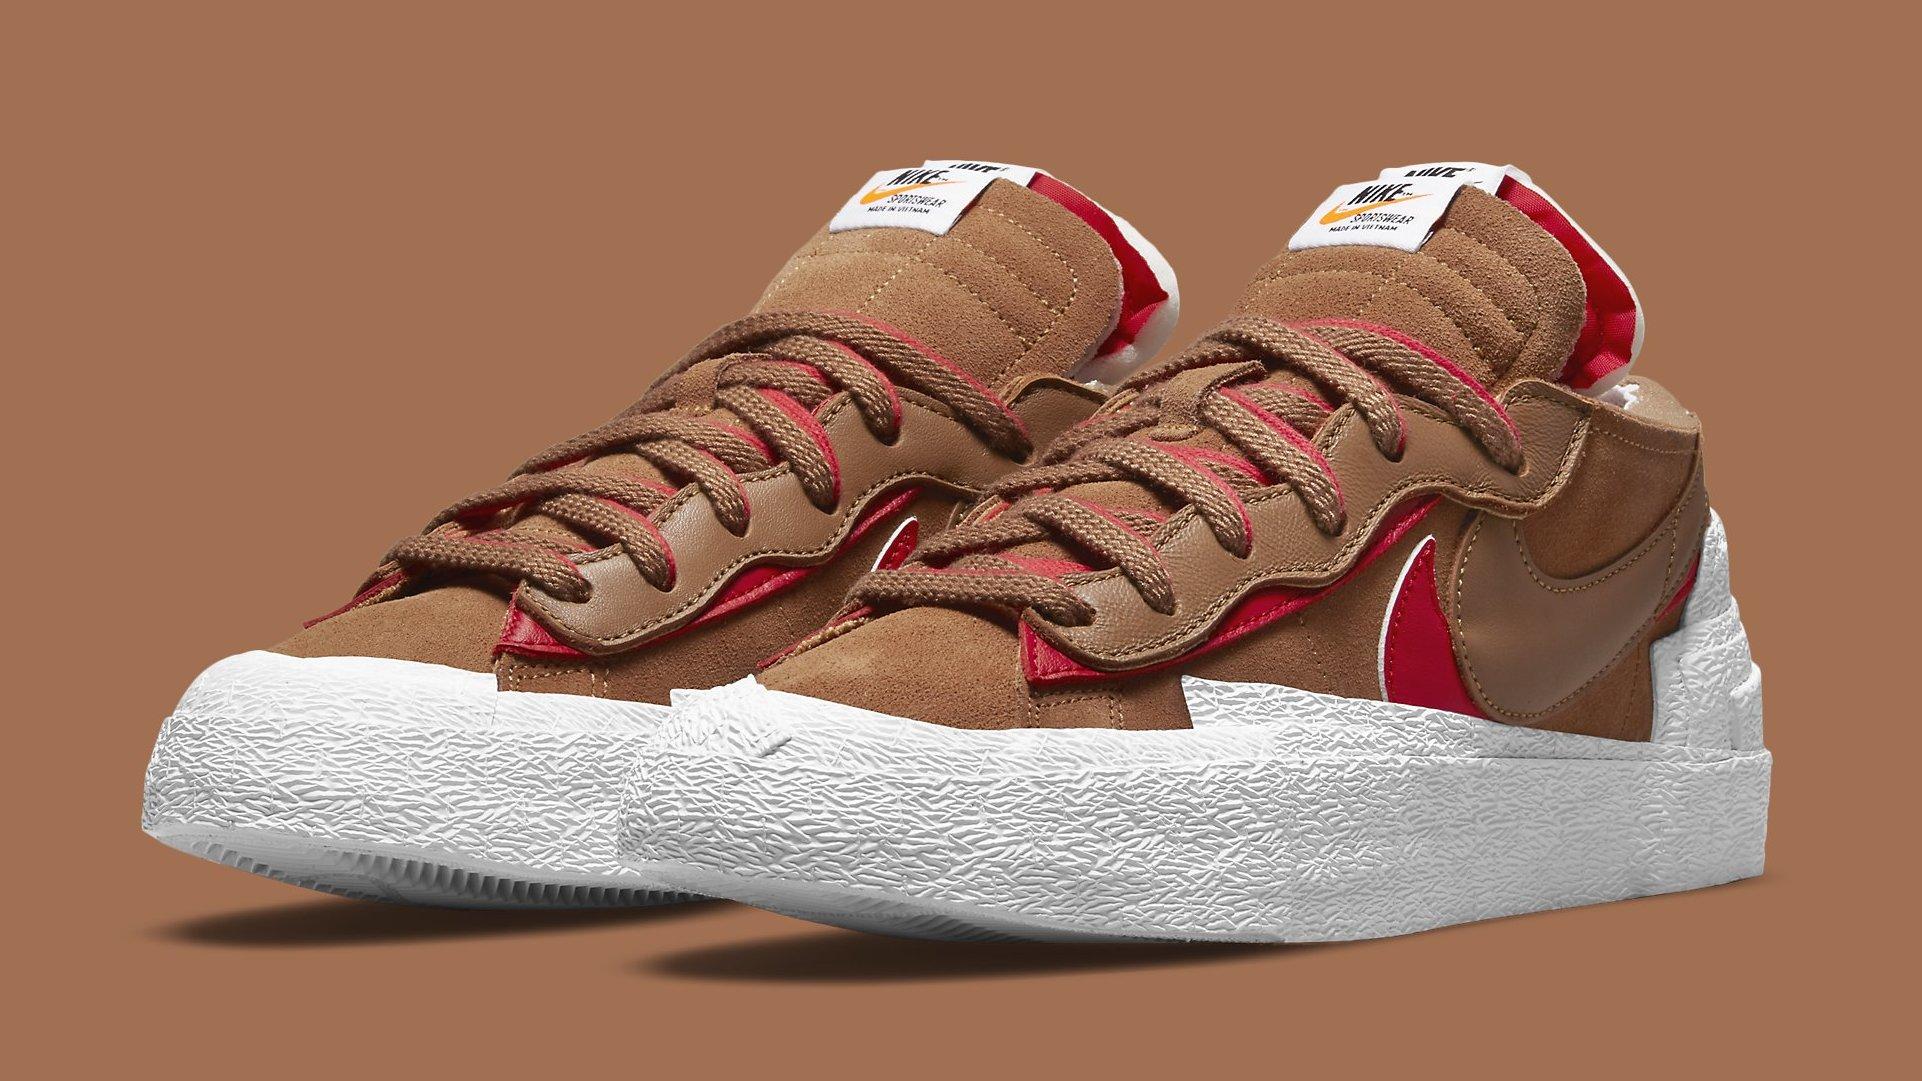 Sacai x Nike Blazer Low 'Iron Grey' 'British Tan' Release Date ...